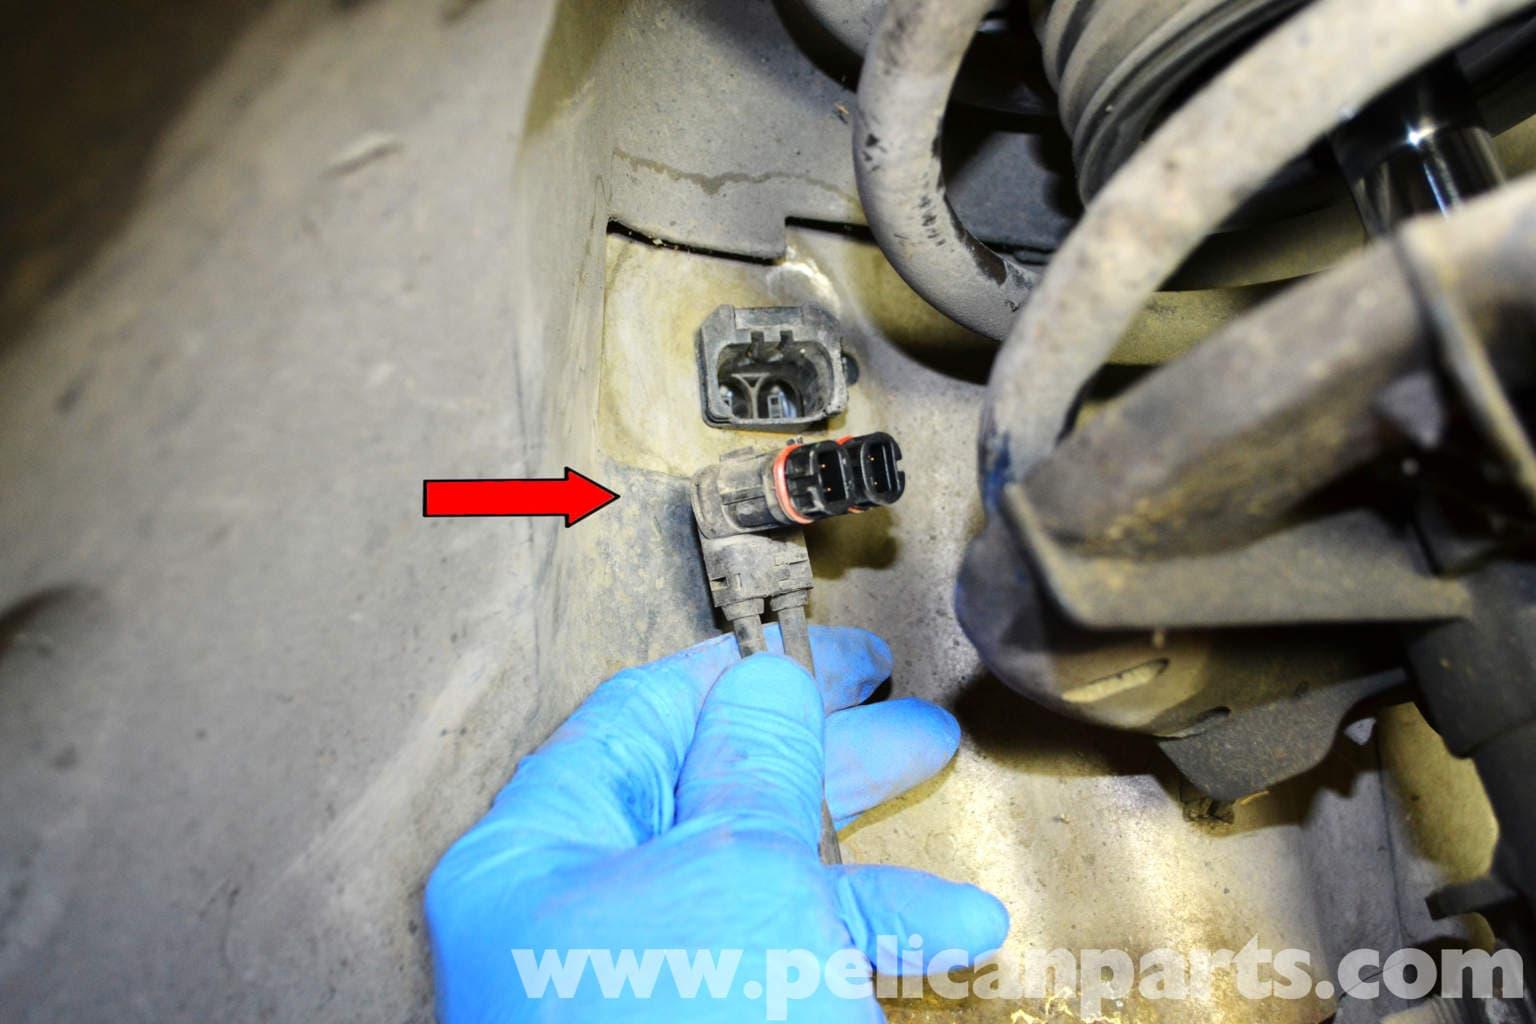 For Sa 200 Wiring Schematics Mercedes Benz W203 Abs Sensor Replacement 2001 2007